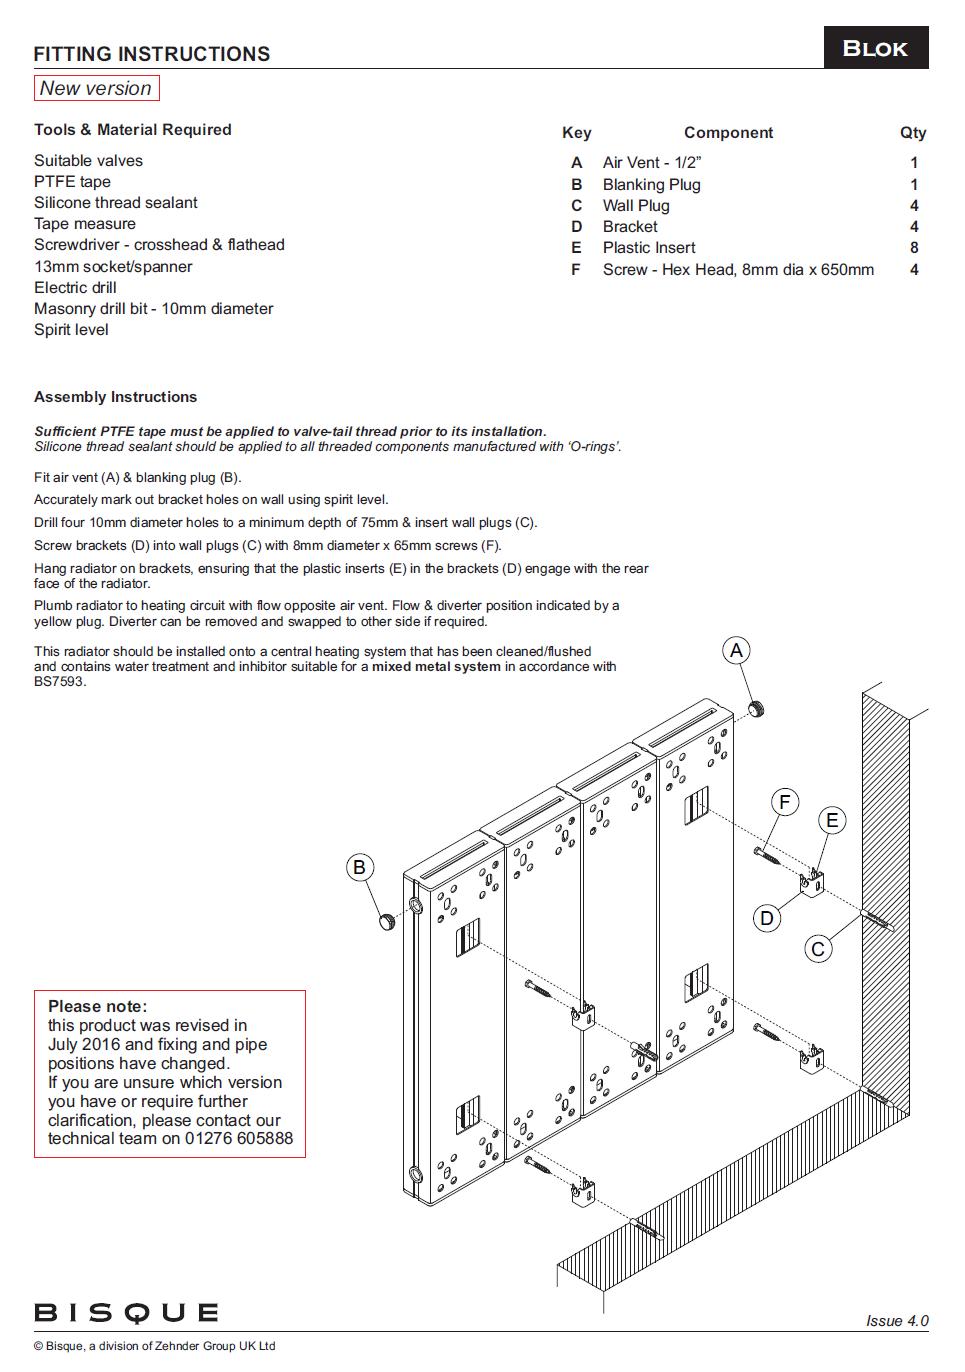 Bisque blok horizontal radiator blok fitting instructions pooptronica